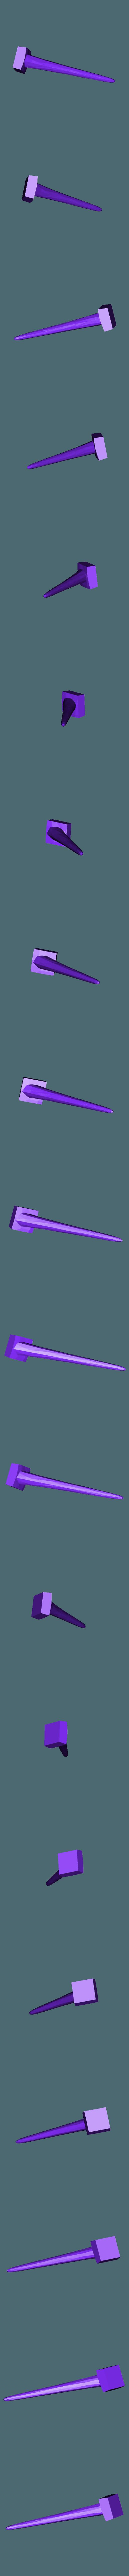 Meowth_whisker_1.obj Download free OBJ file Life-Sized Meowth • 3D print model, JayOmega